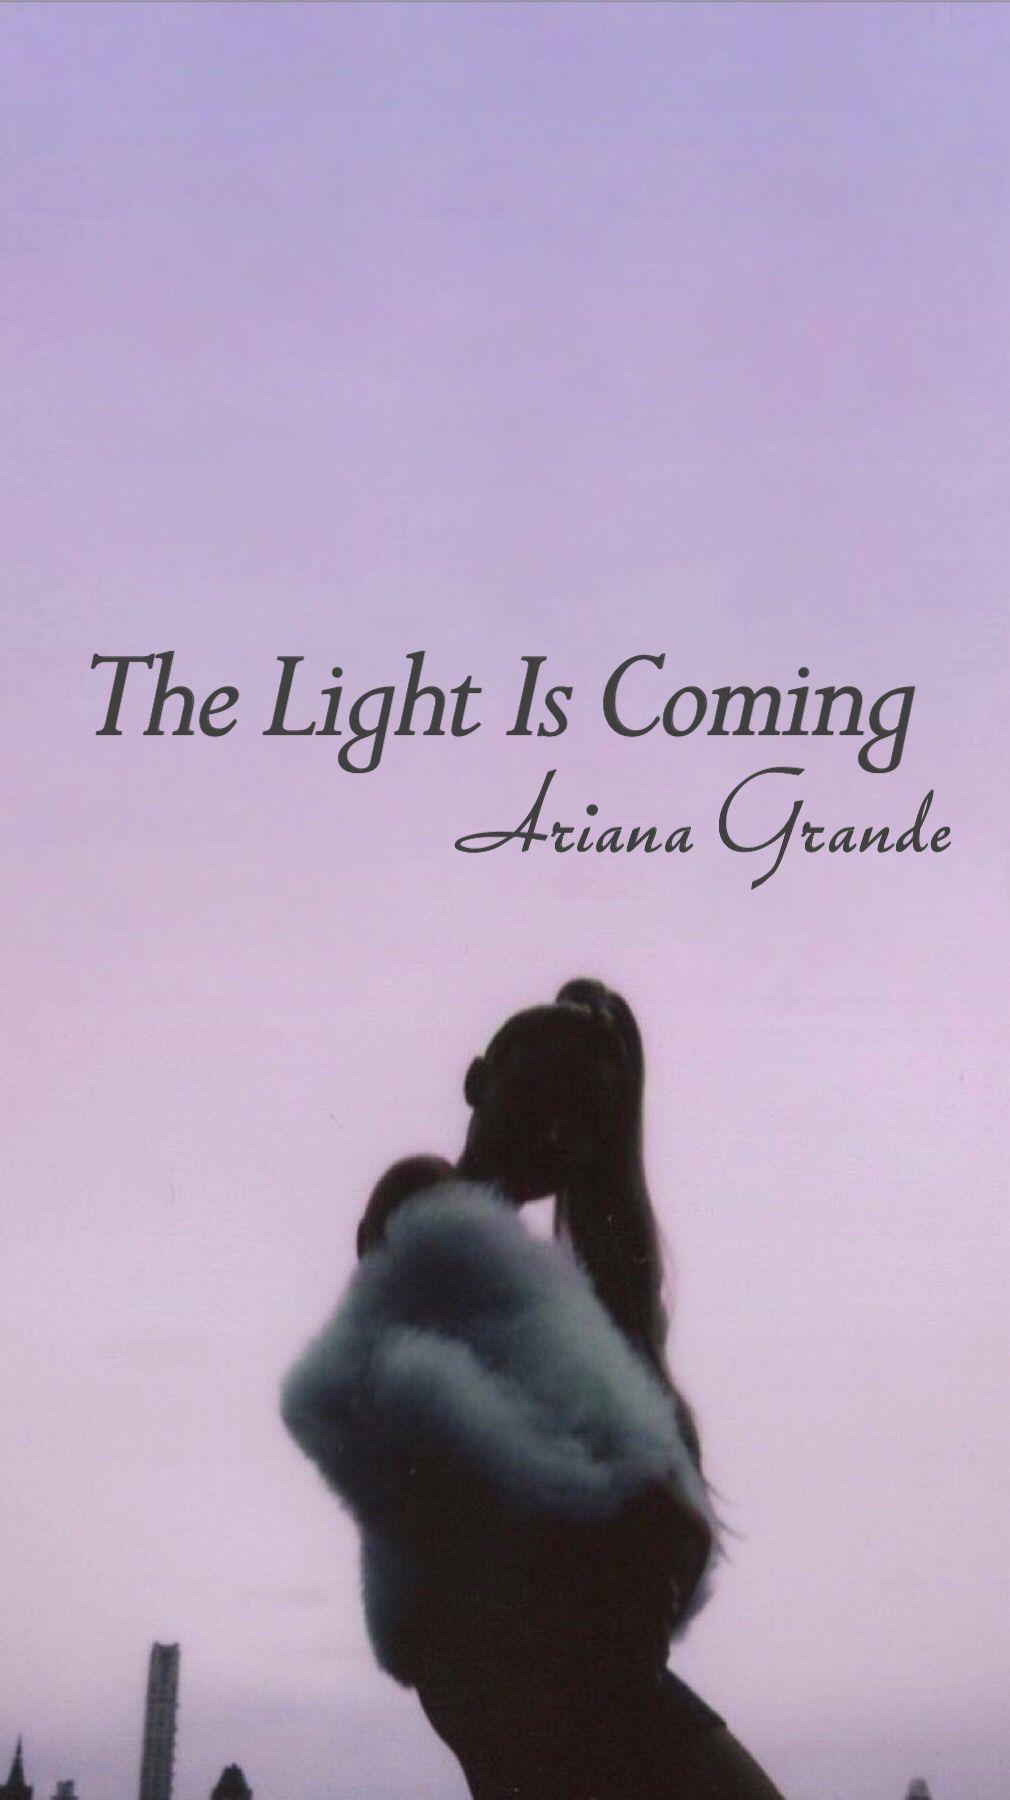 Ariana Grande Aesthetic Wallpapers Top Free Ariana Grande Aesthetic Backgrounds Wallpaperaccess